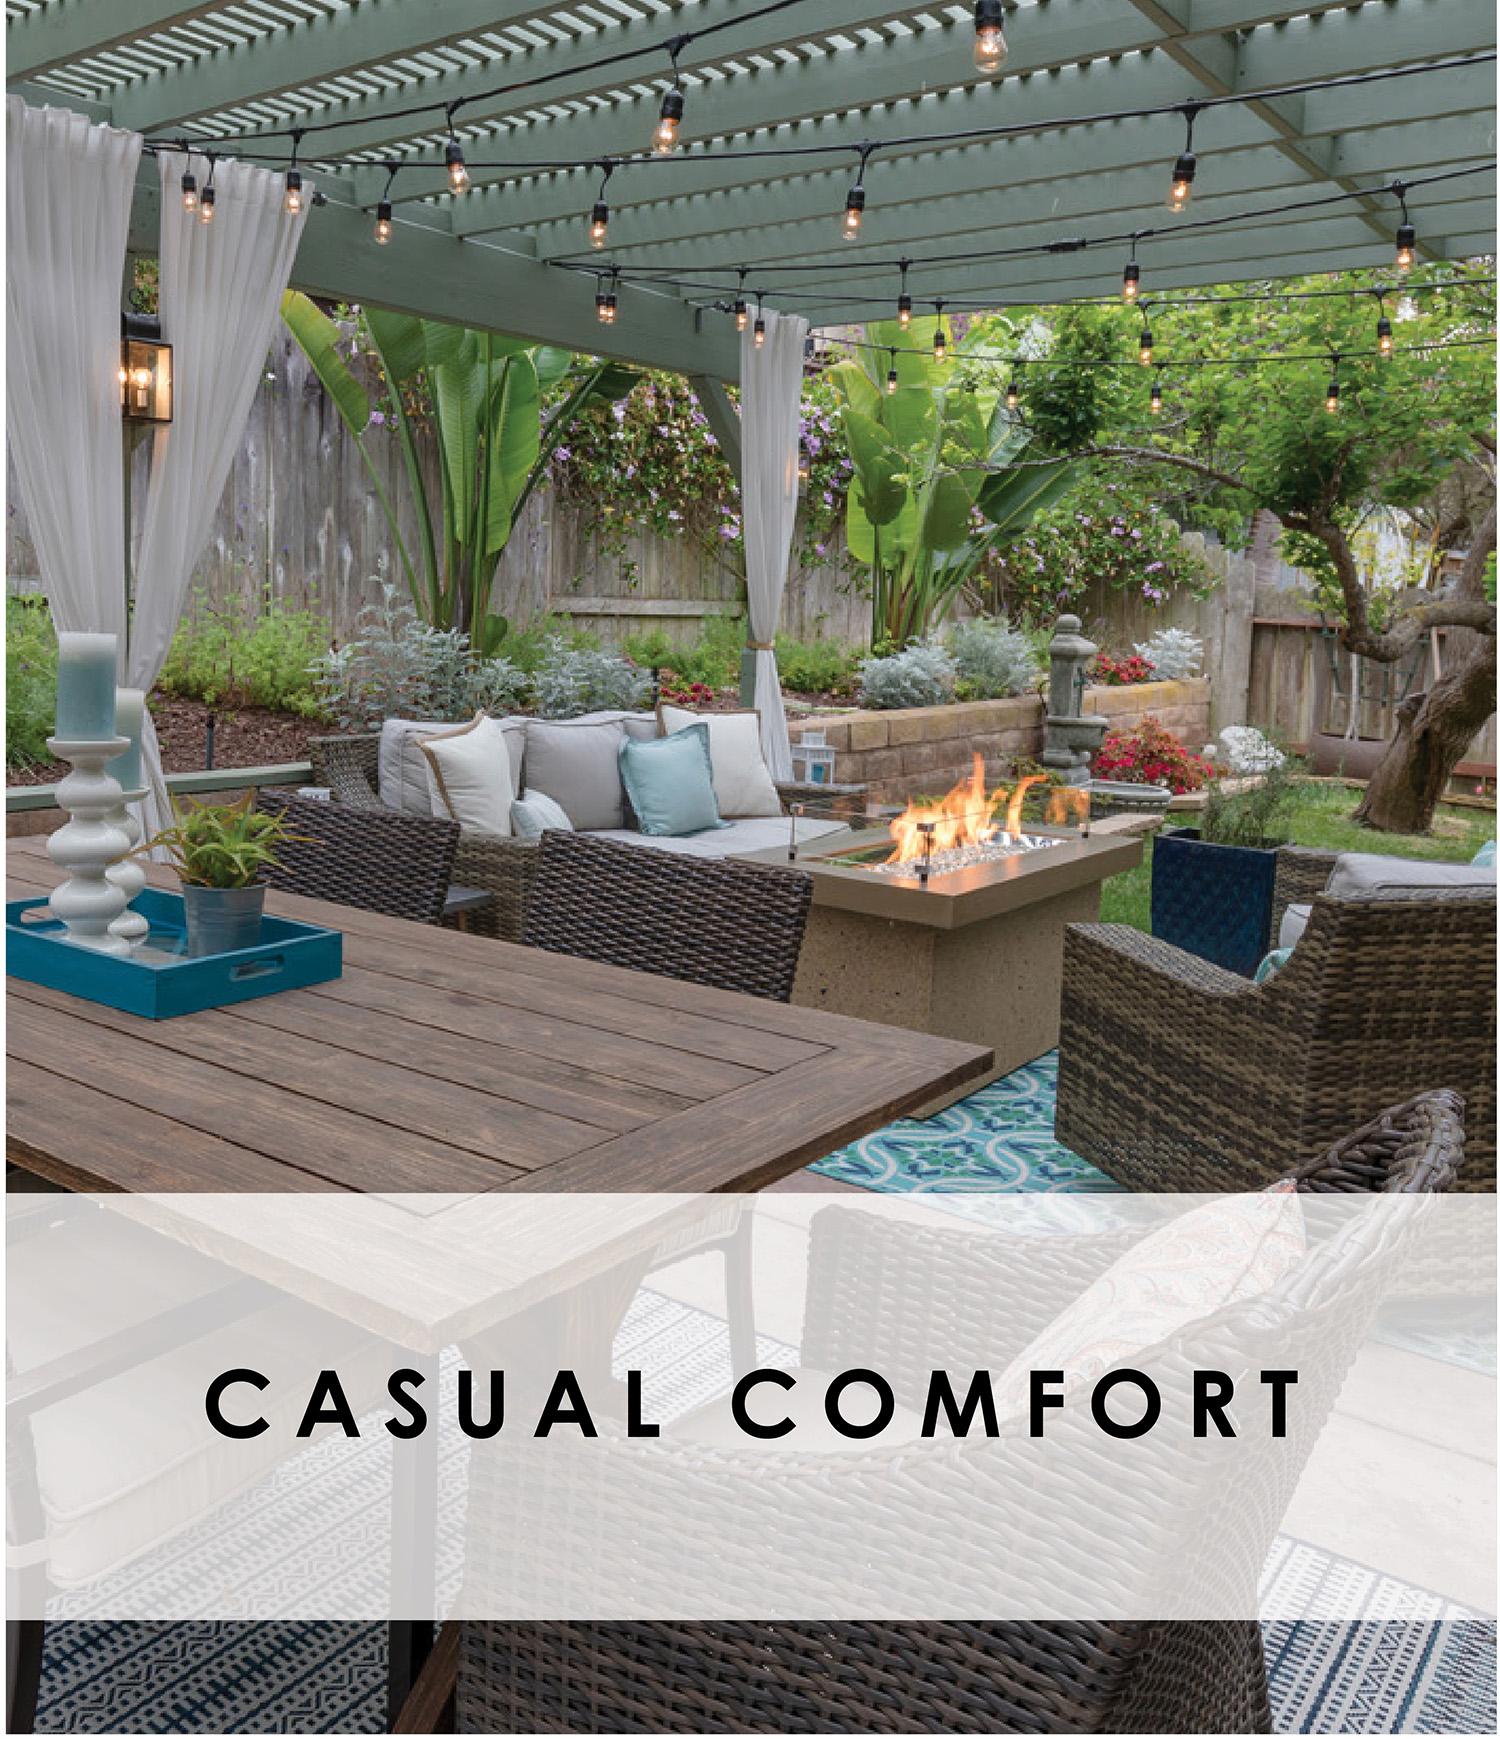 Casual-Comfort.jpg